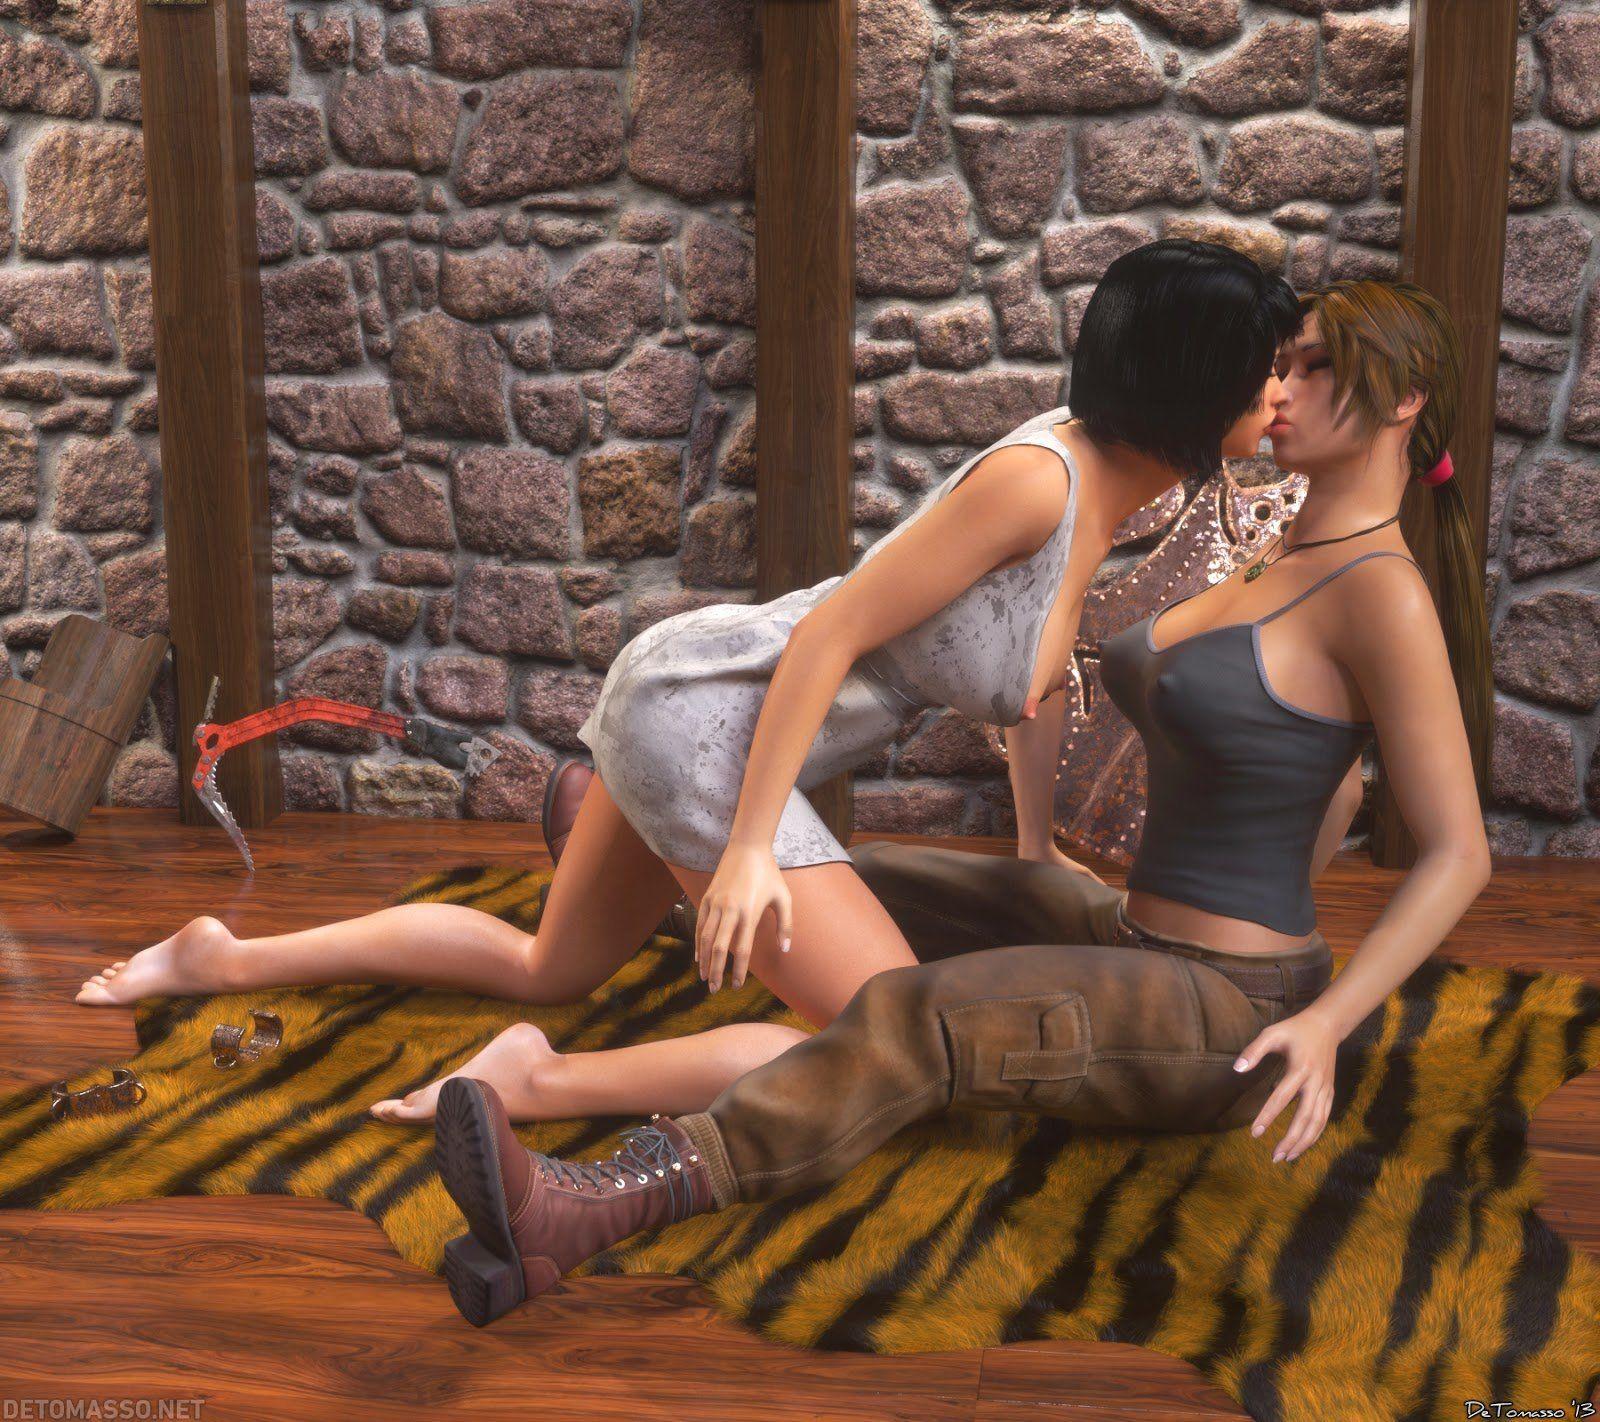 hentaihome.net-Tomb-Raider-porno-3D-4